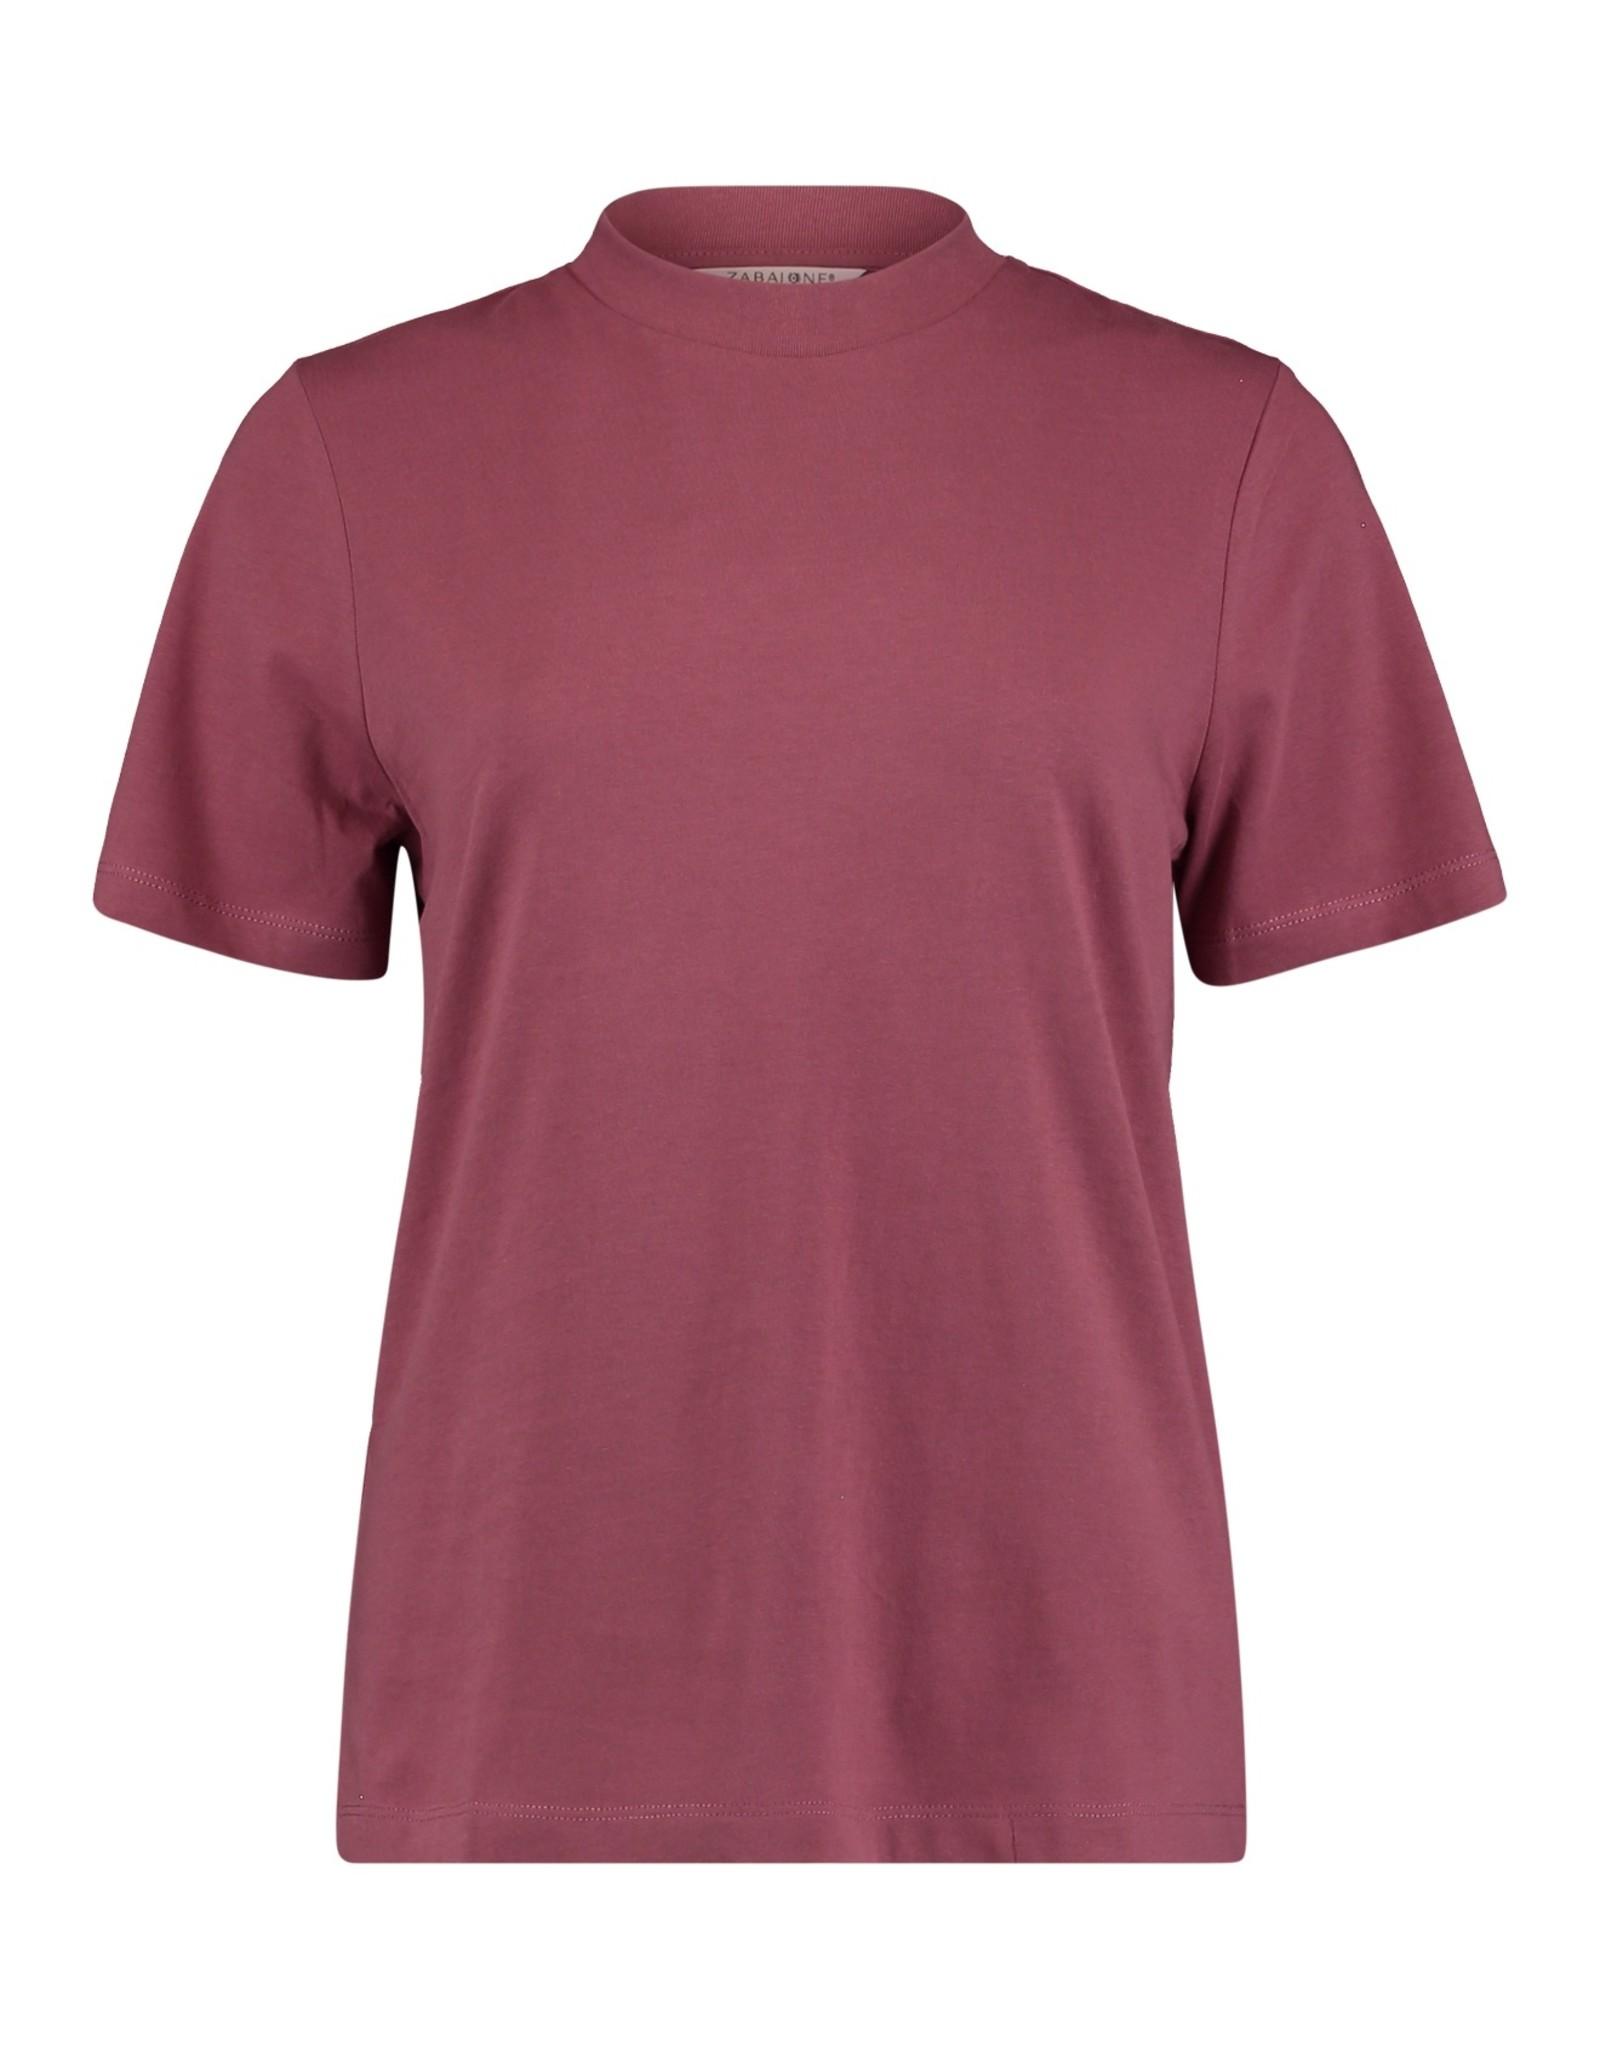 Zabaione T-shirt Ricky Berry